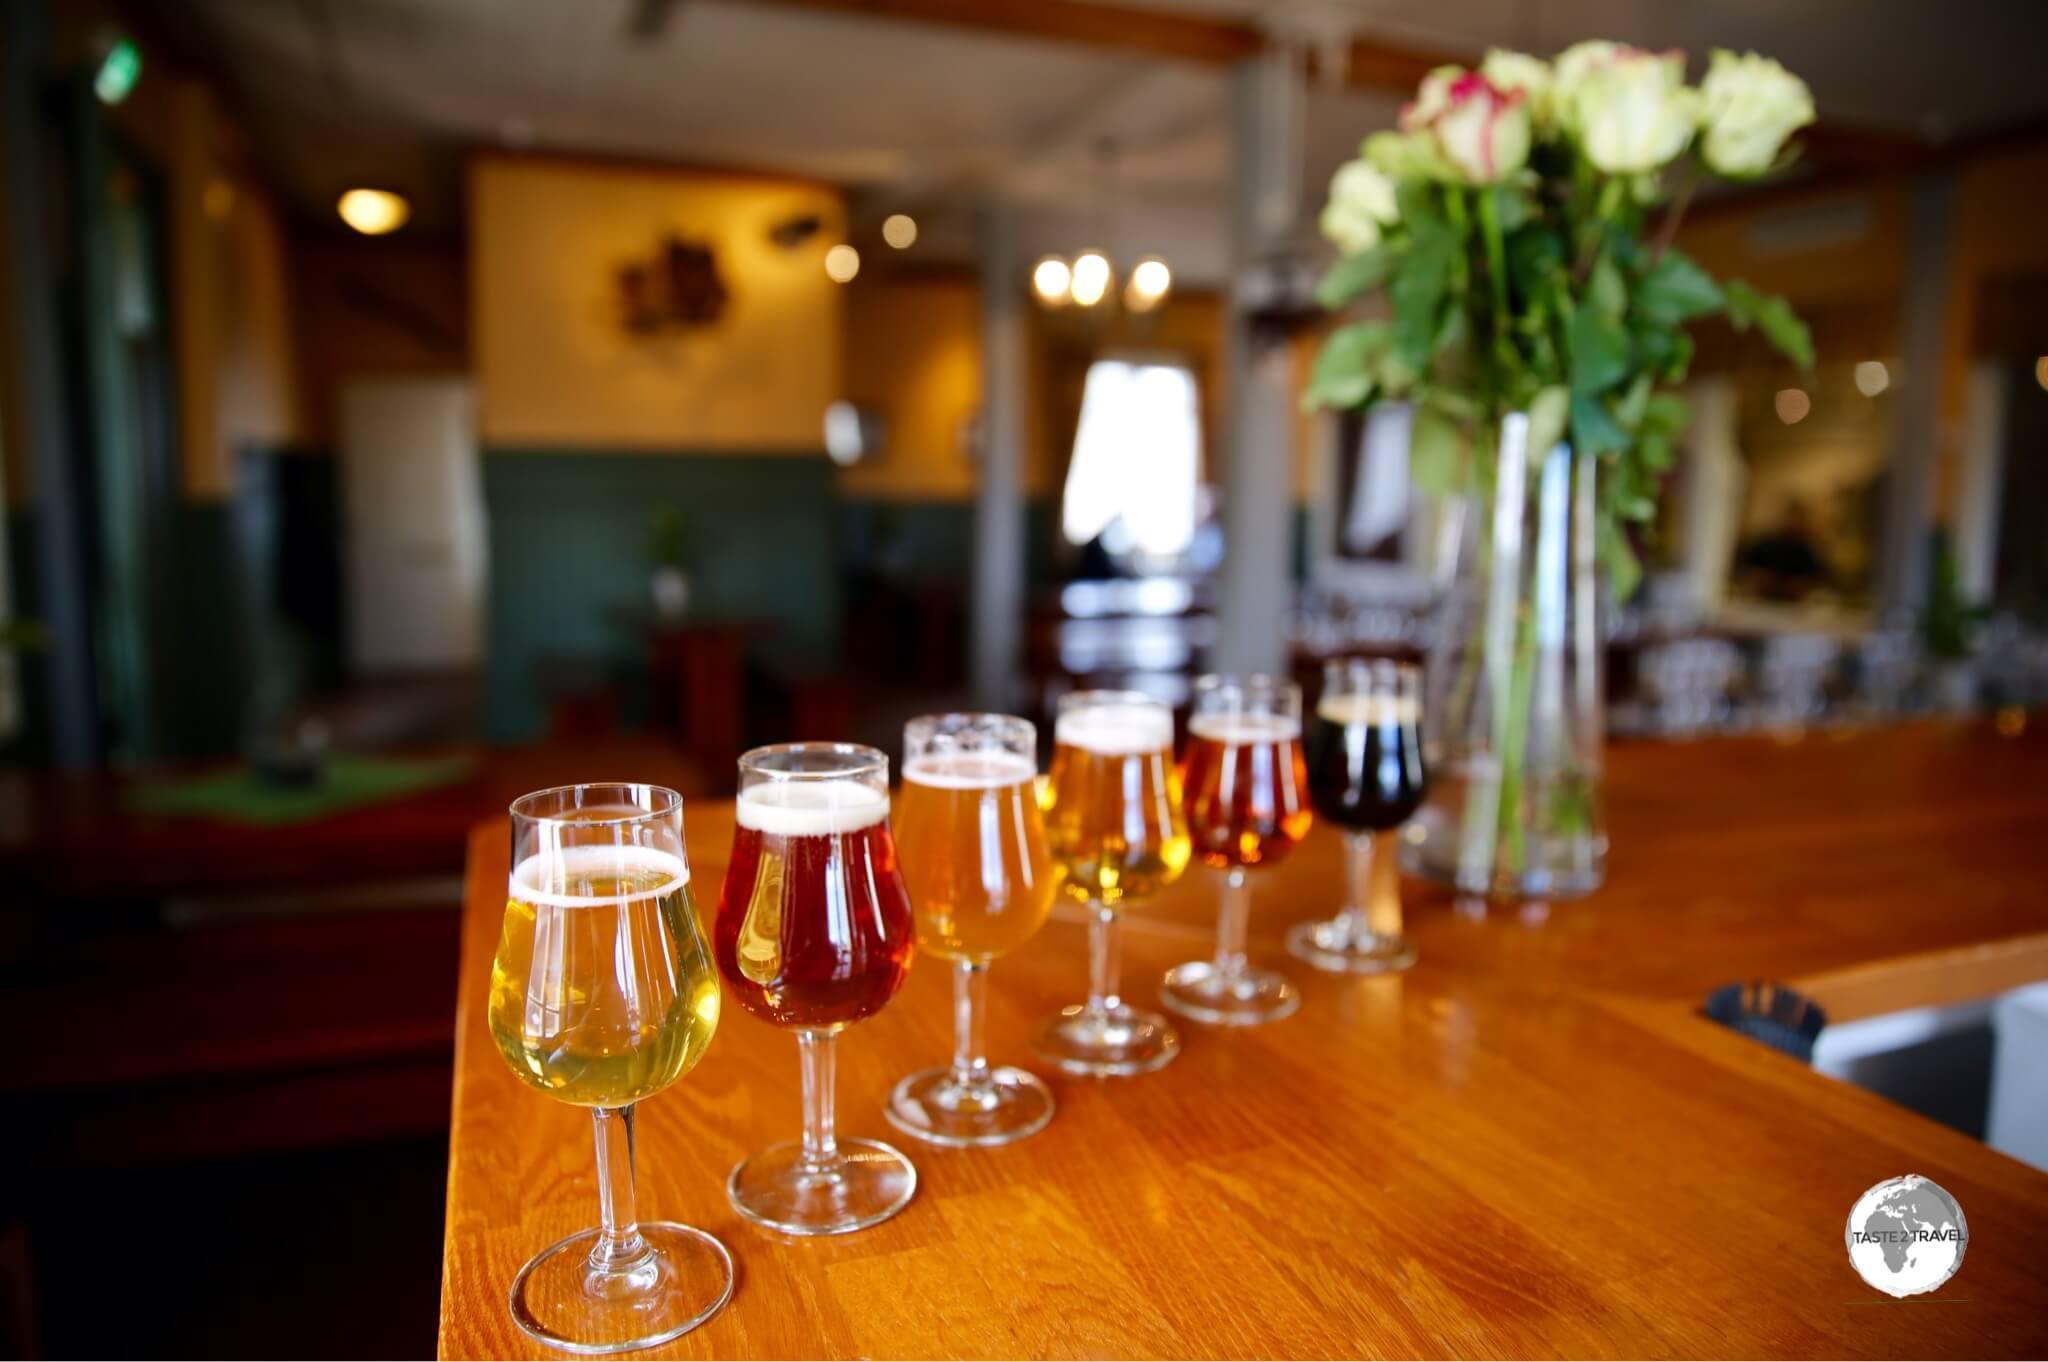 Beer tasting at the Skallhagen Brewery.